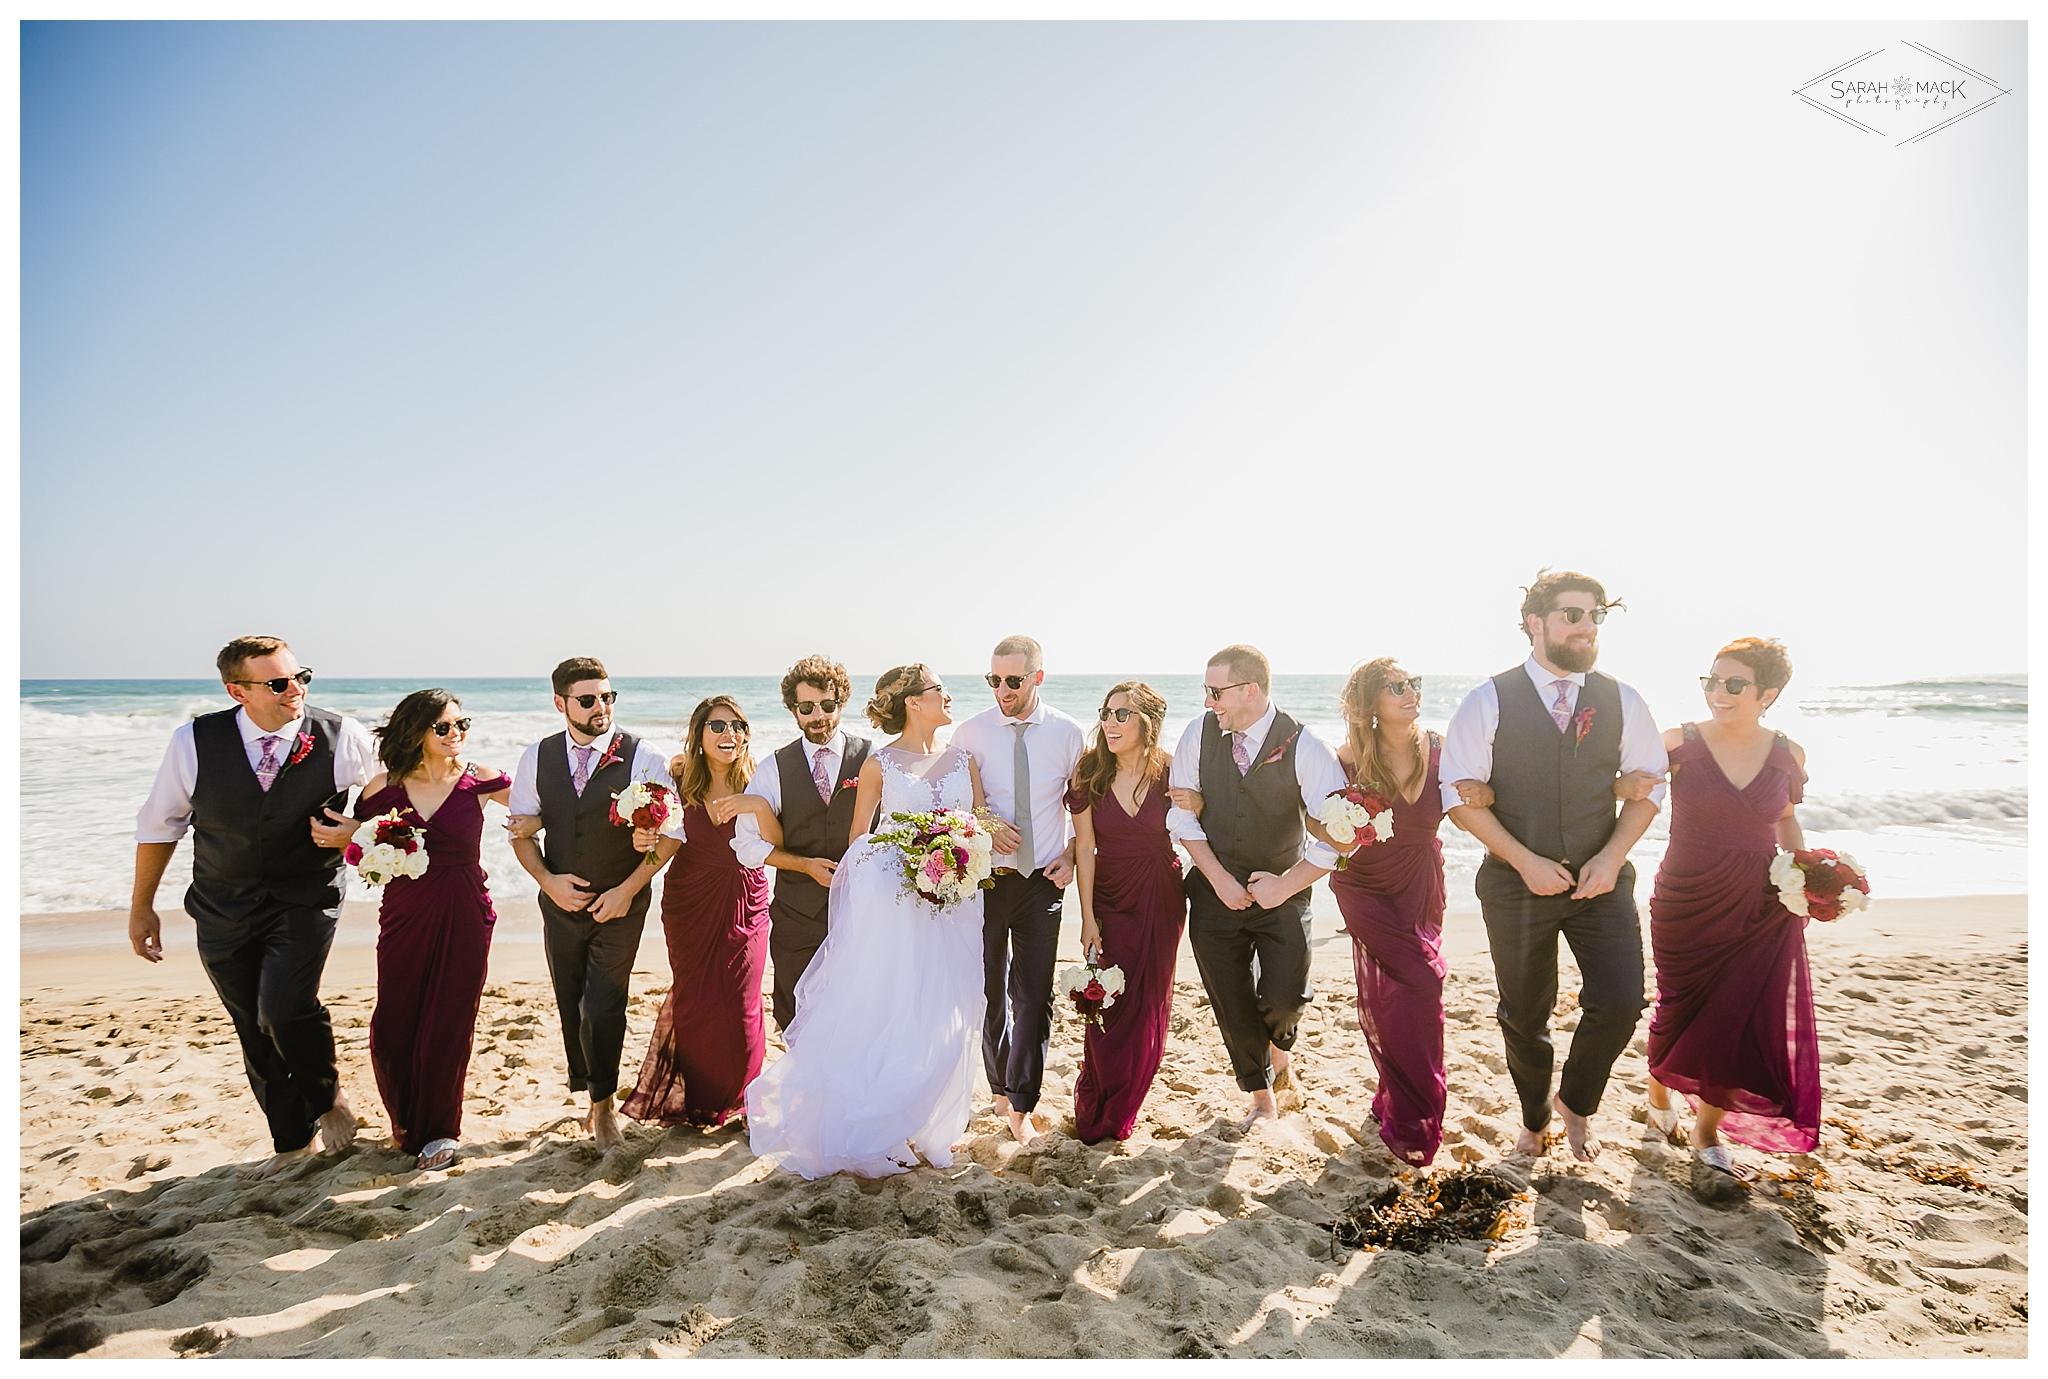 MR-Sea-Cliffe-Country-Club-Huntington-Beach-Wedding-0102.jpg